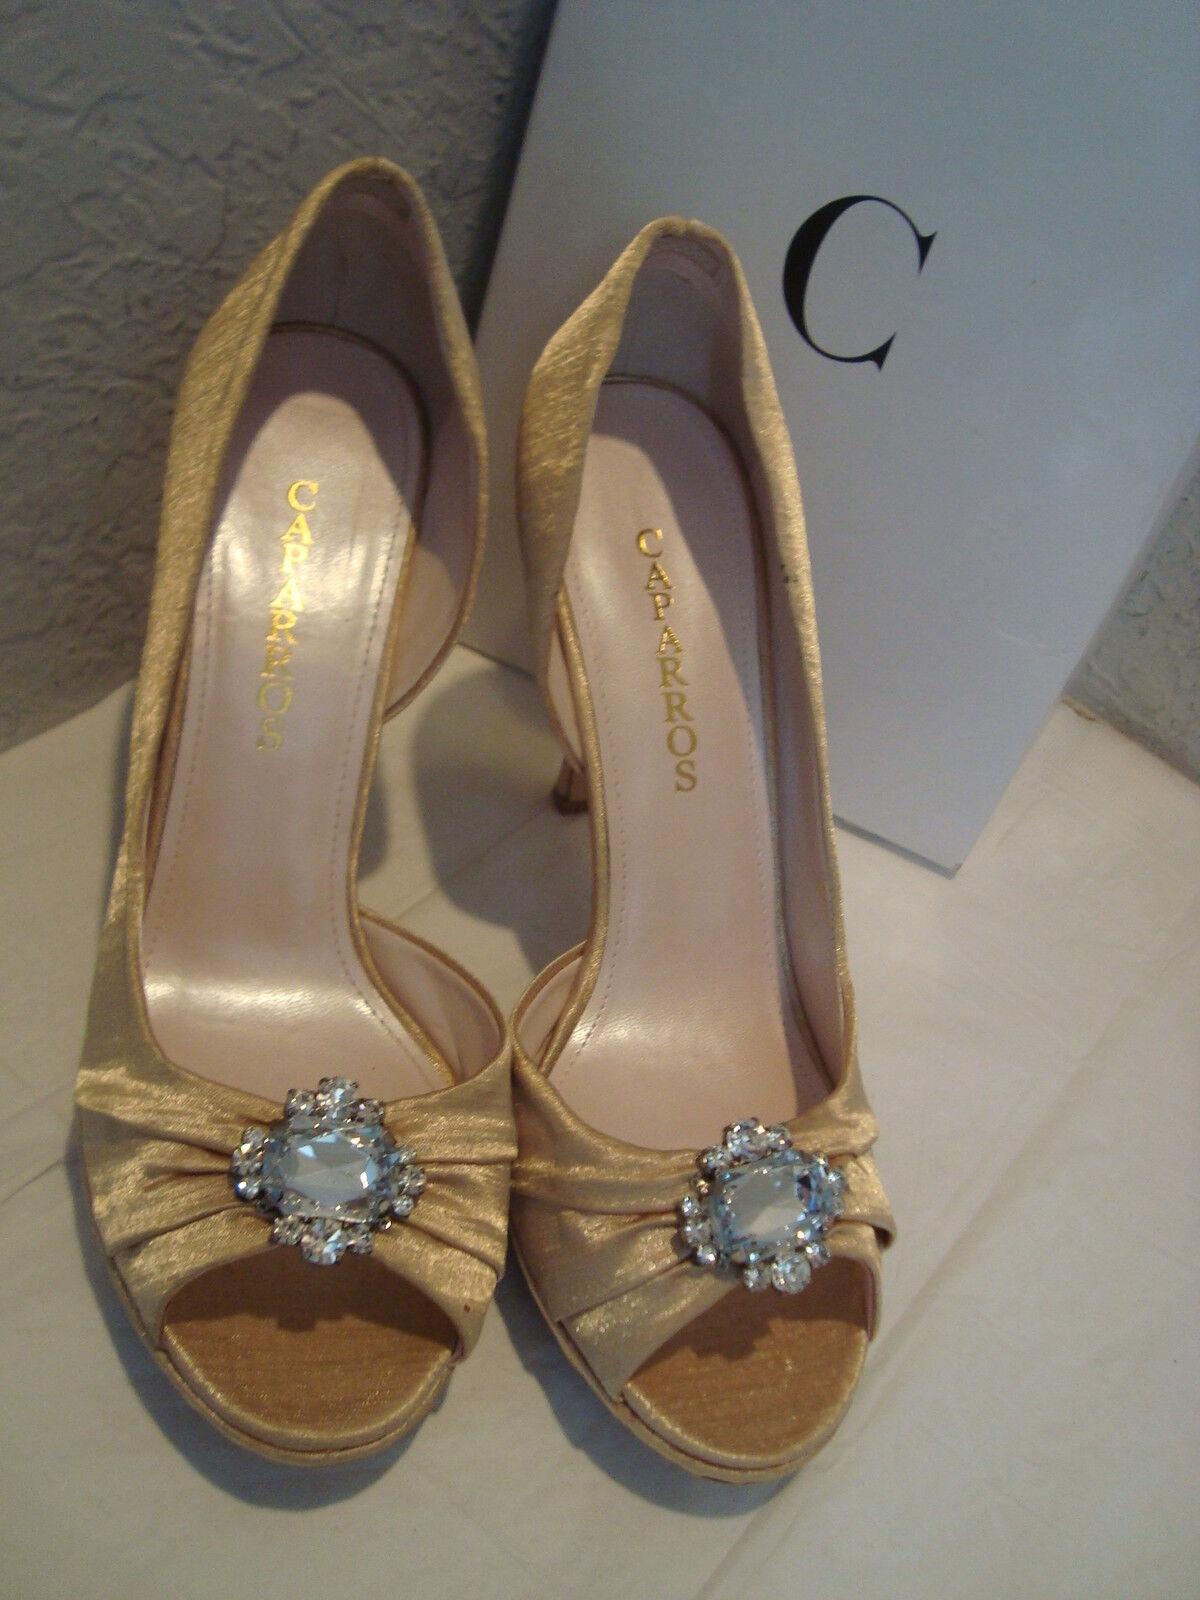 NEU Caparros Damenschuhe Varda Satin Shimmer Light Gold Pumps Schuhes 10 Medium